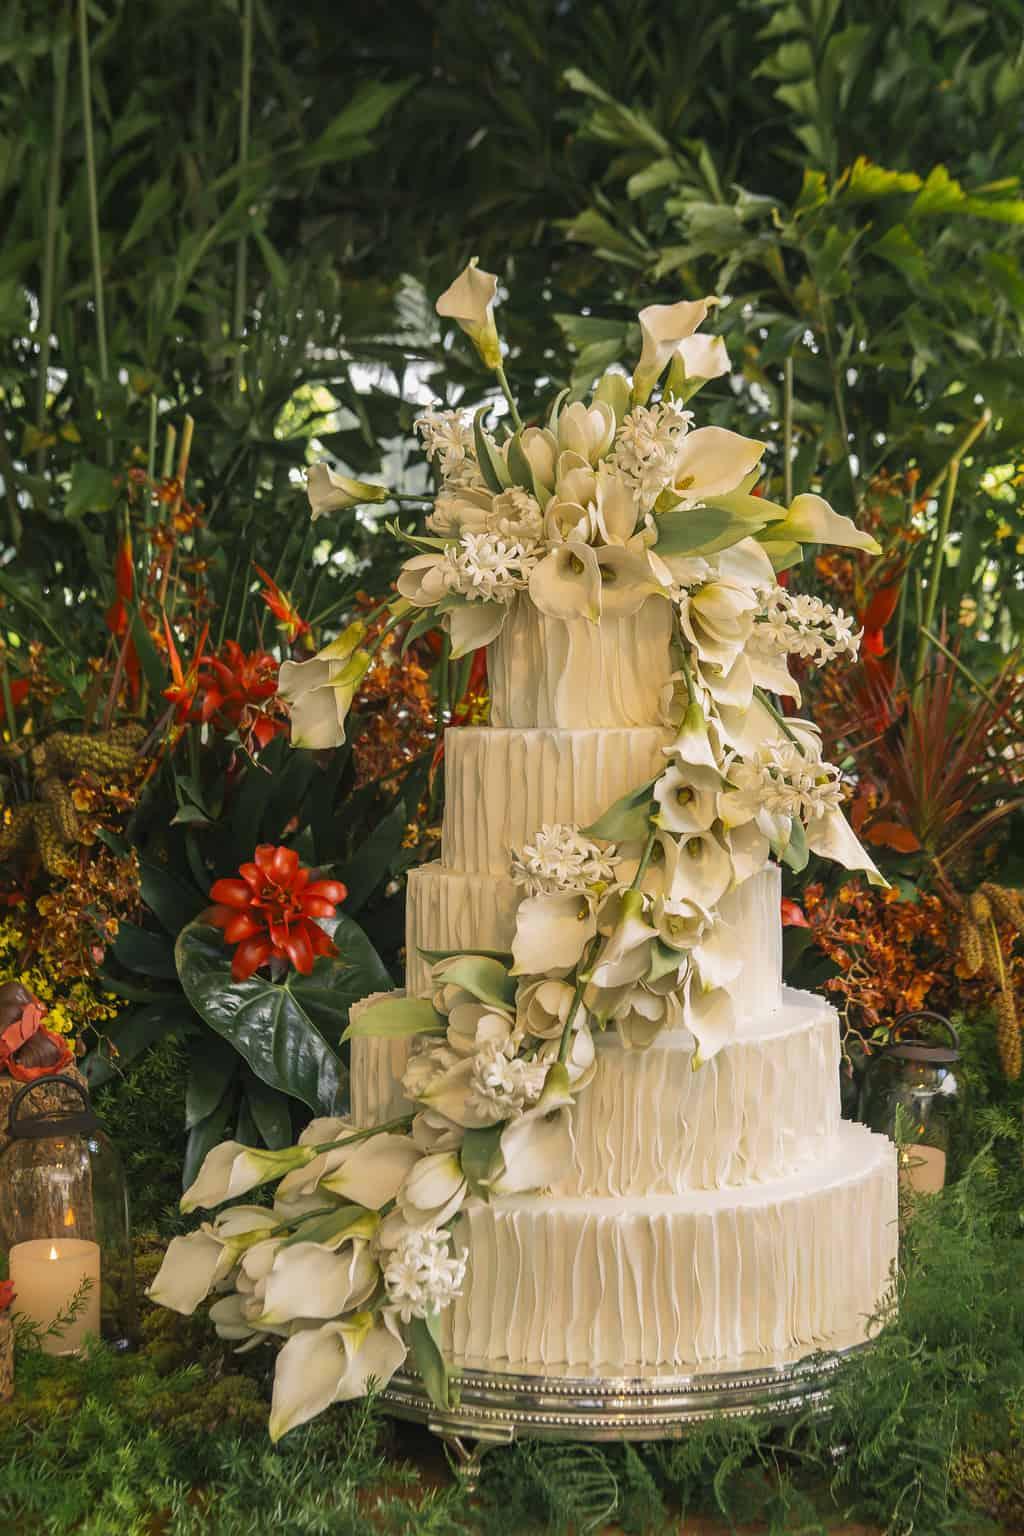 Fernanda-e-Max-Fazenda-Santa-Barbara-Foto-Torin-Zanette-Fabio-e-Telma-Decorações-The-King-Cake1896